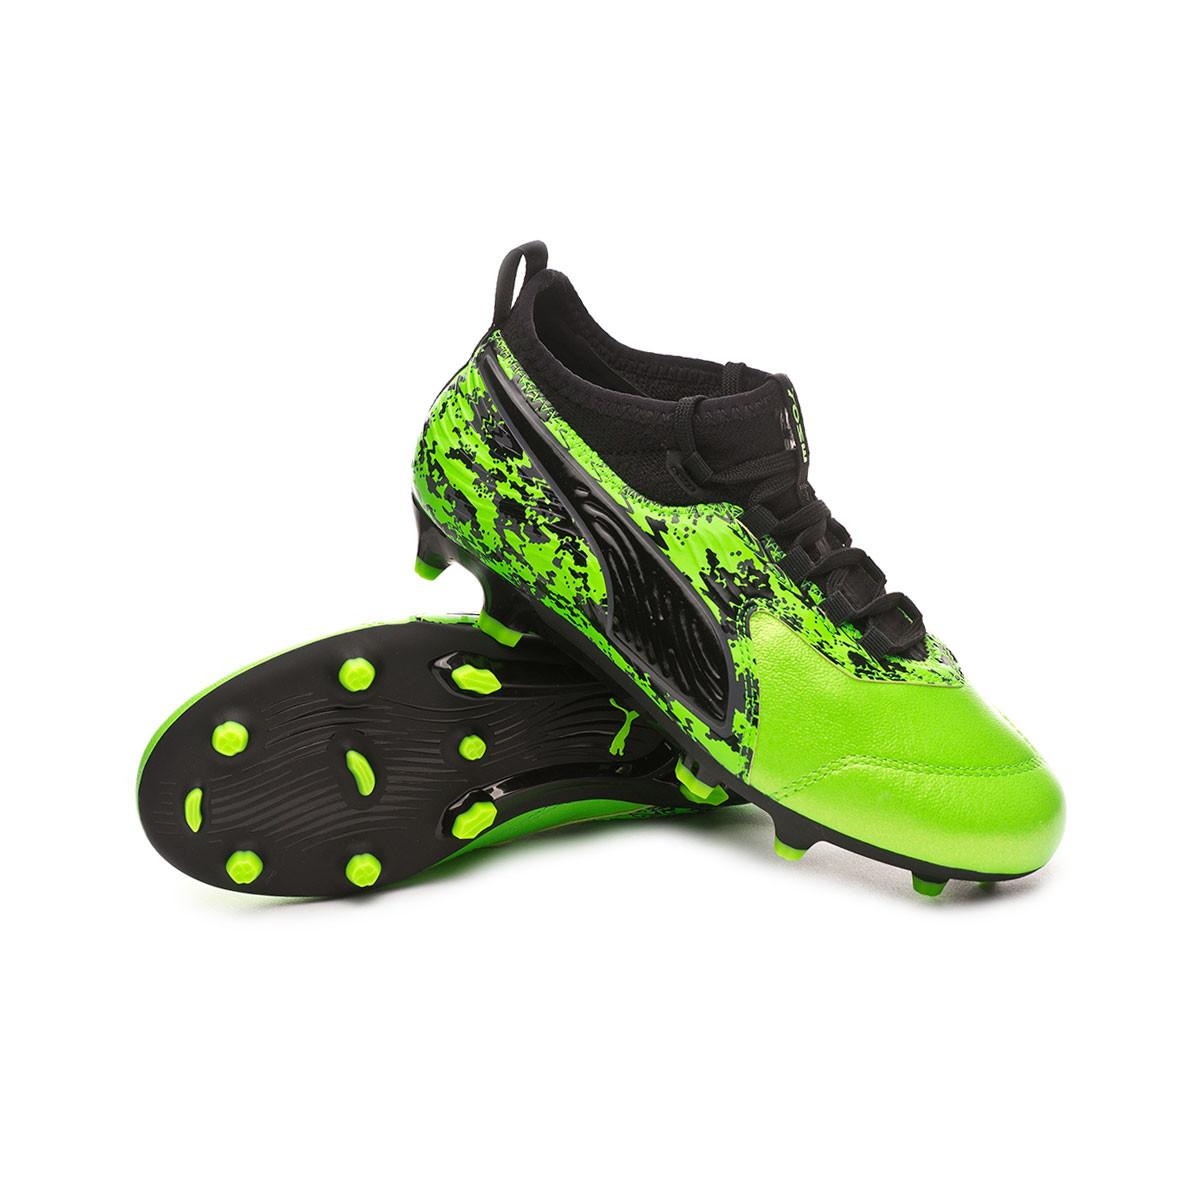 560400894f3 Zapatos de fútbol Puma One 19.3 FG AG Niño Green gecko-Puma black-Charcoal  gray - Tienda de fútbol Fútbol Emotion